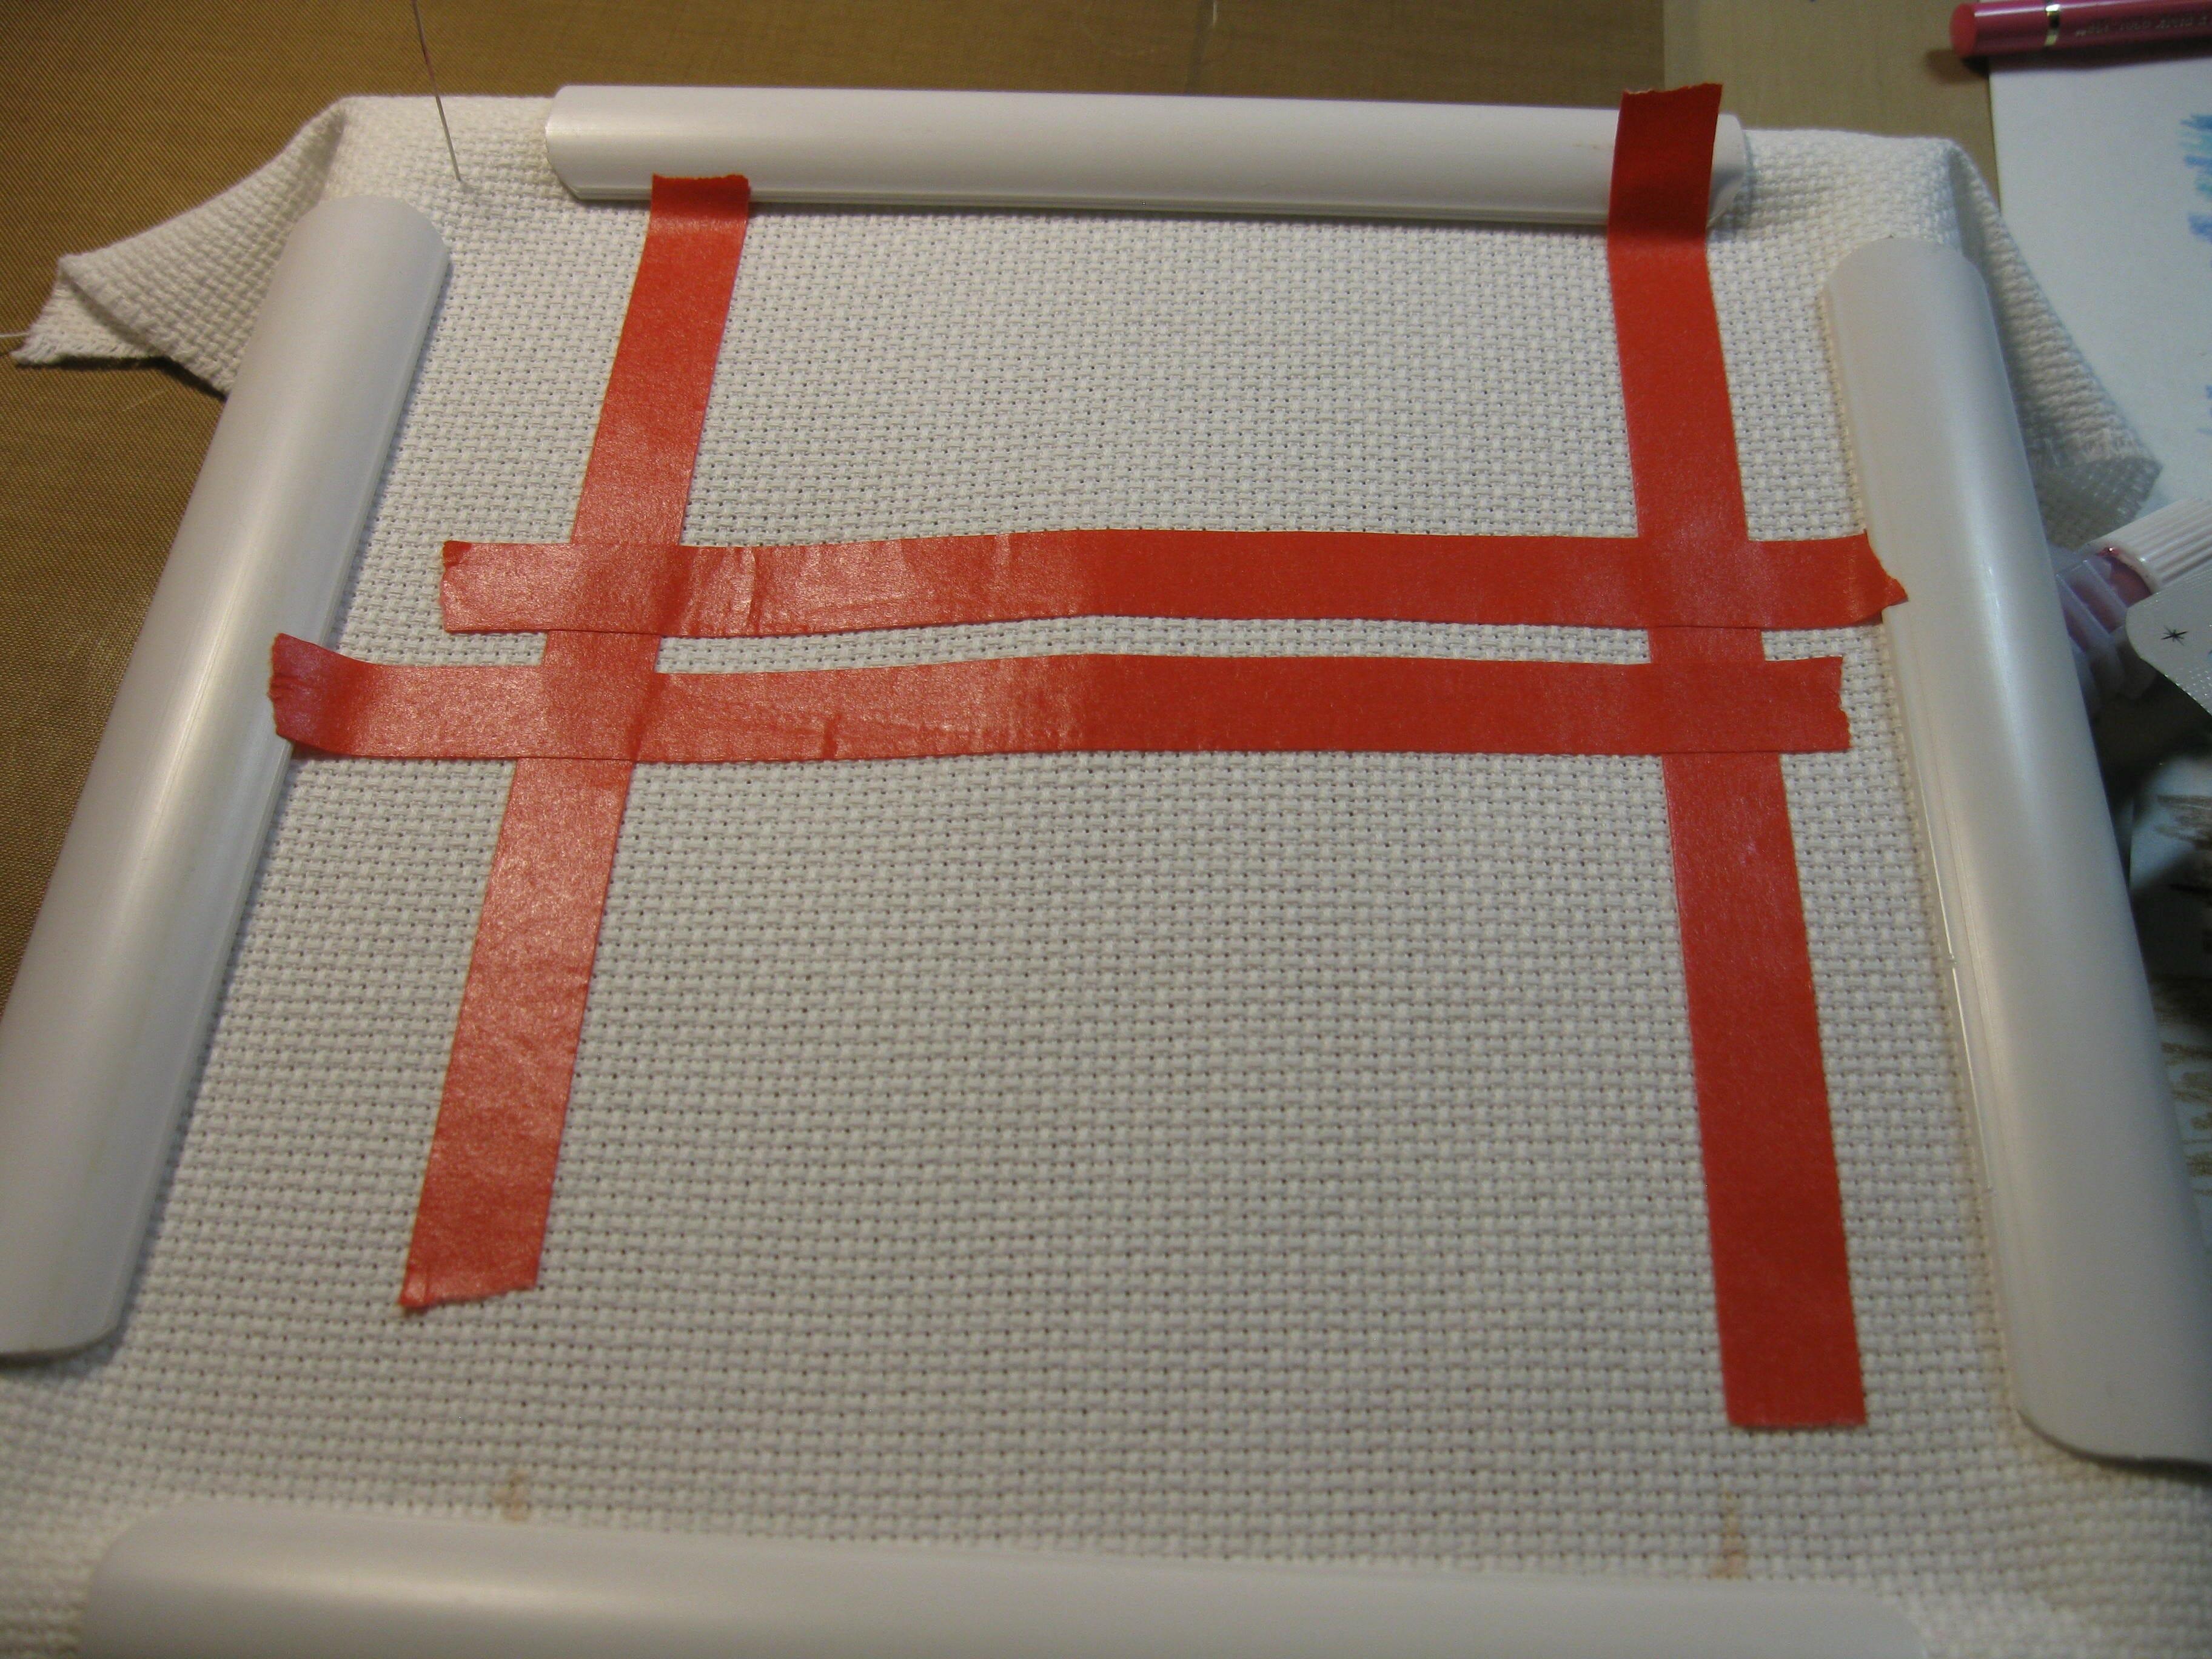 Applying Fabric Paint to Aida Cloth